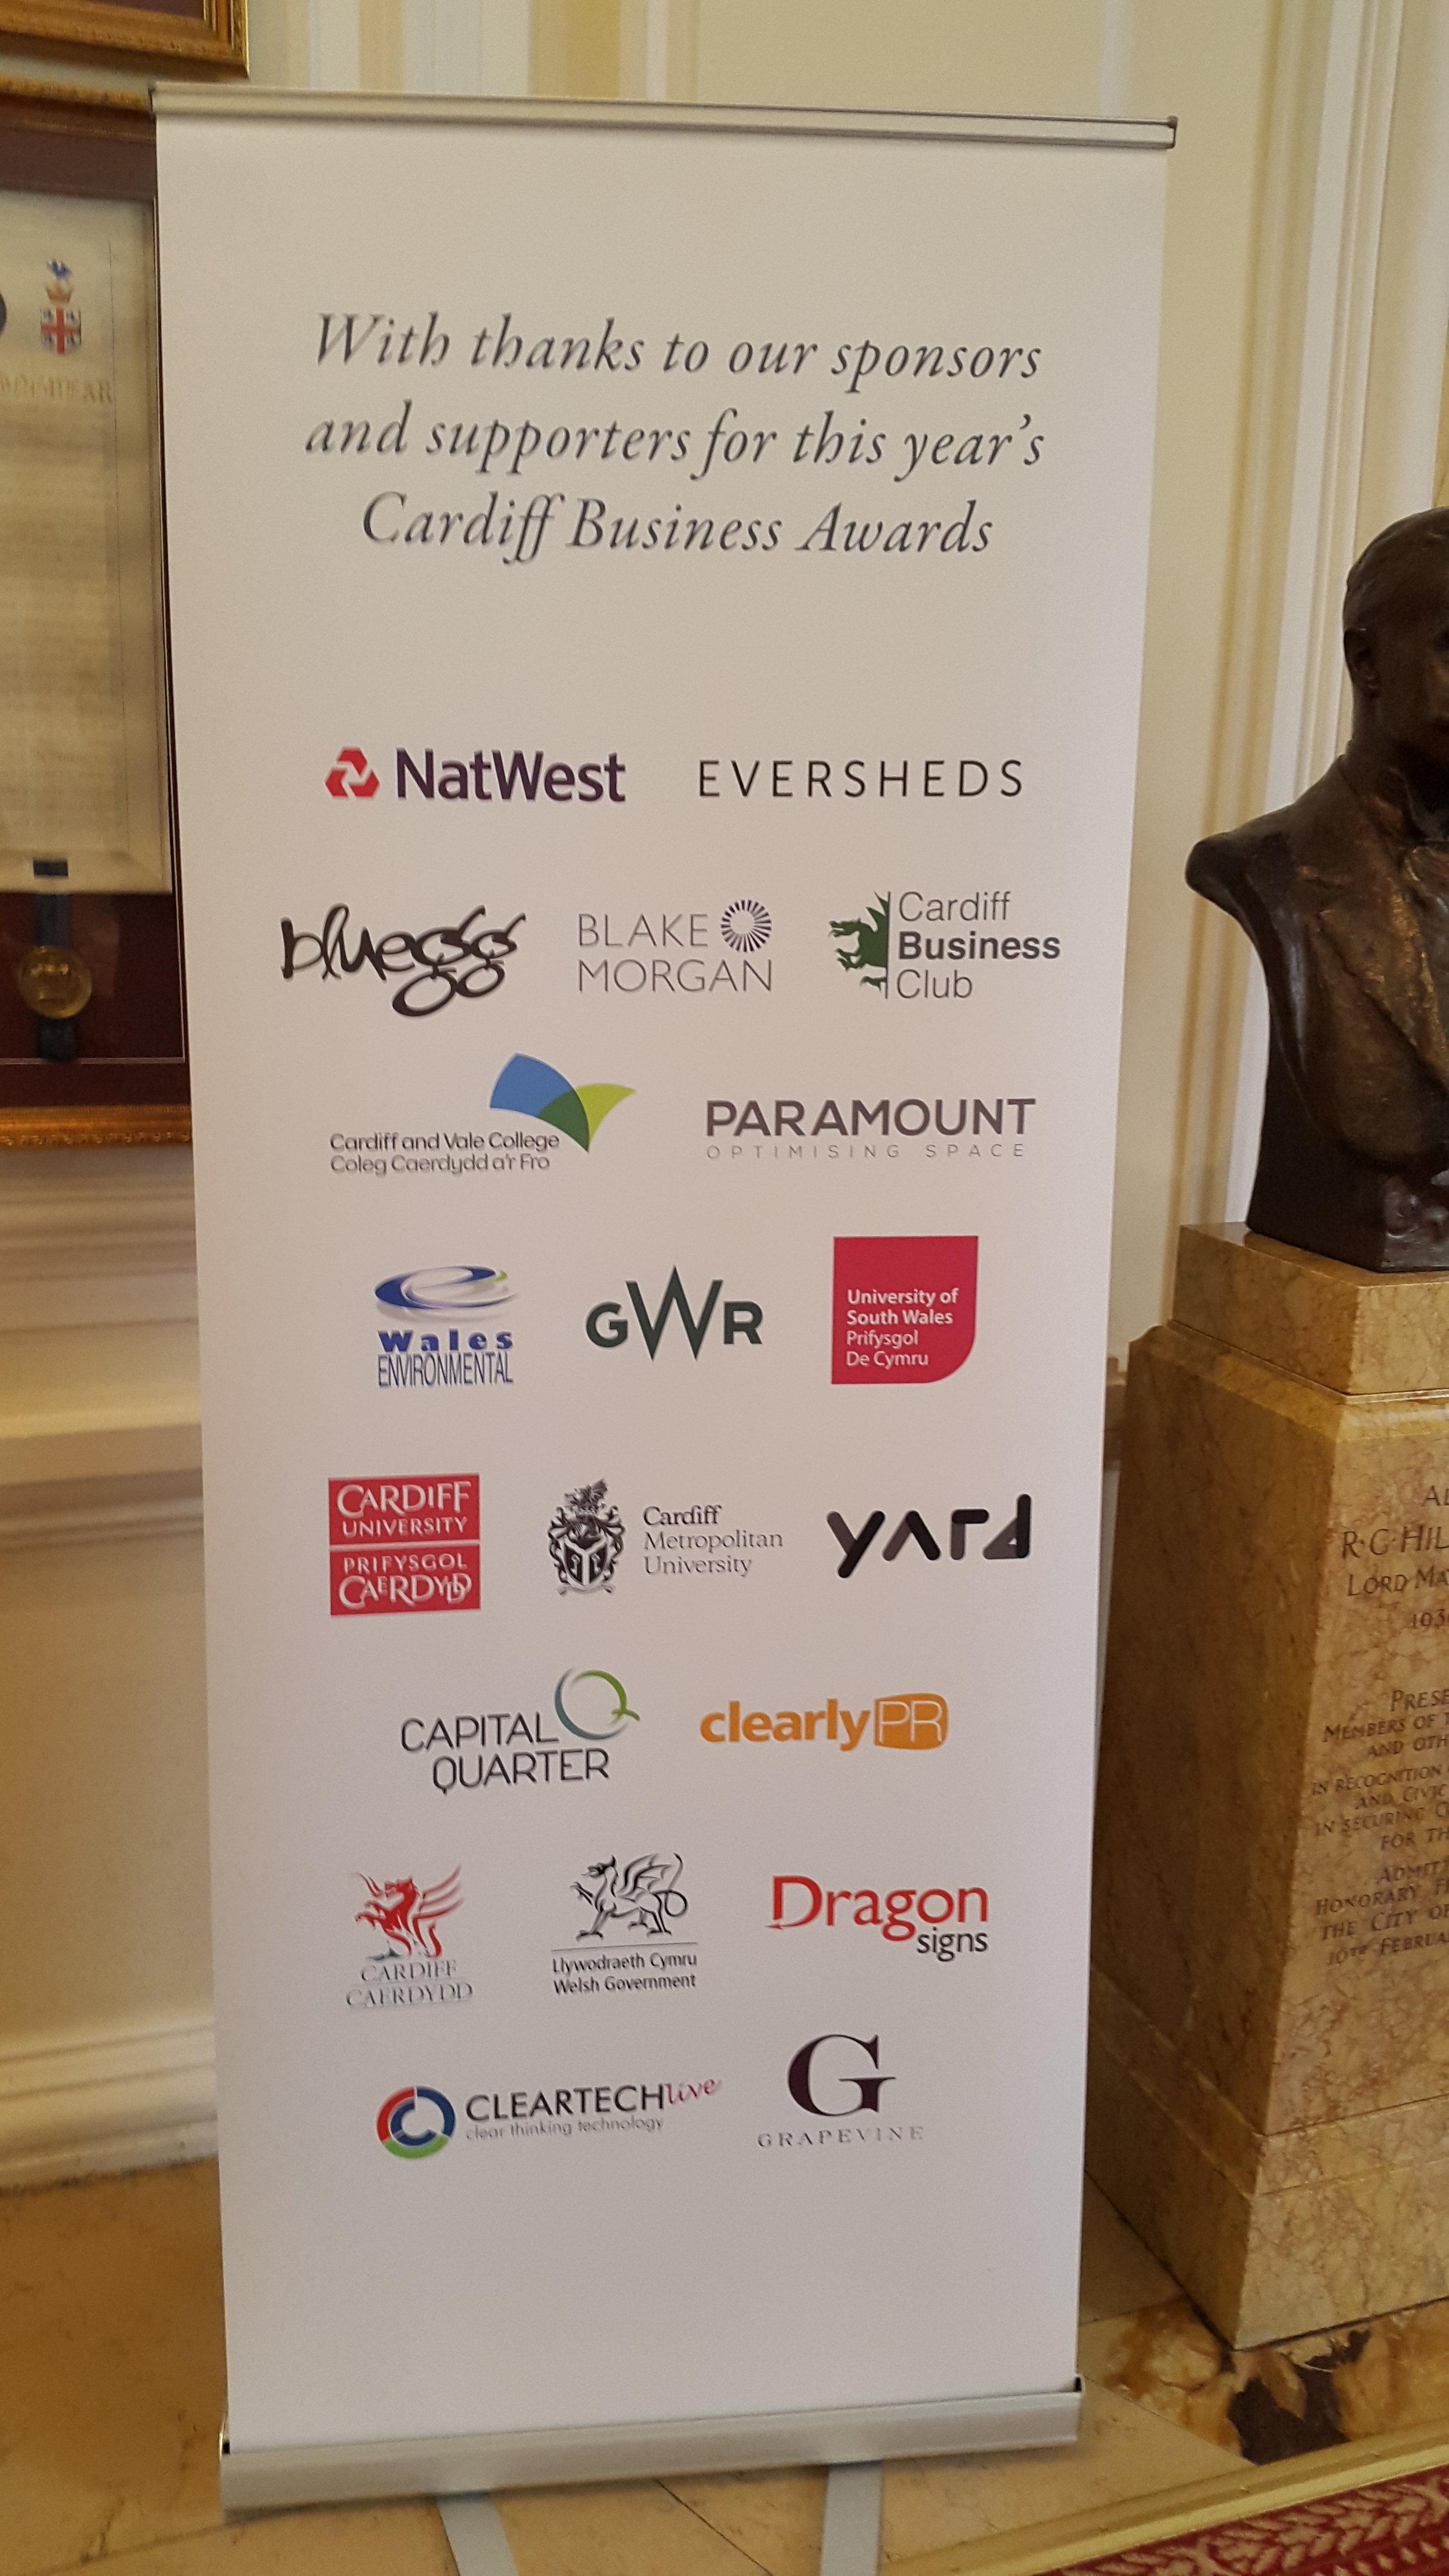 Cardiff Business Awards Sponsors